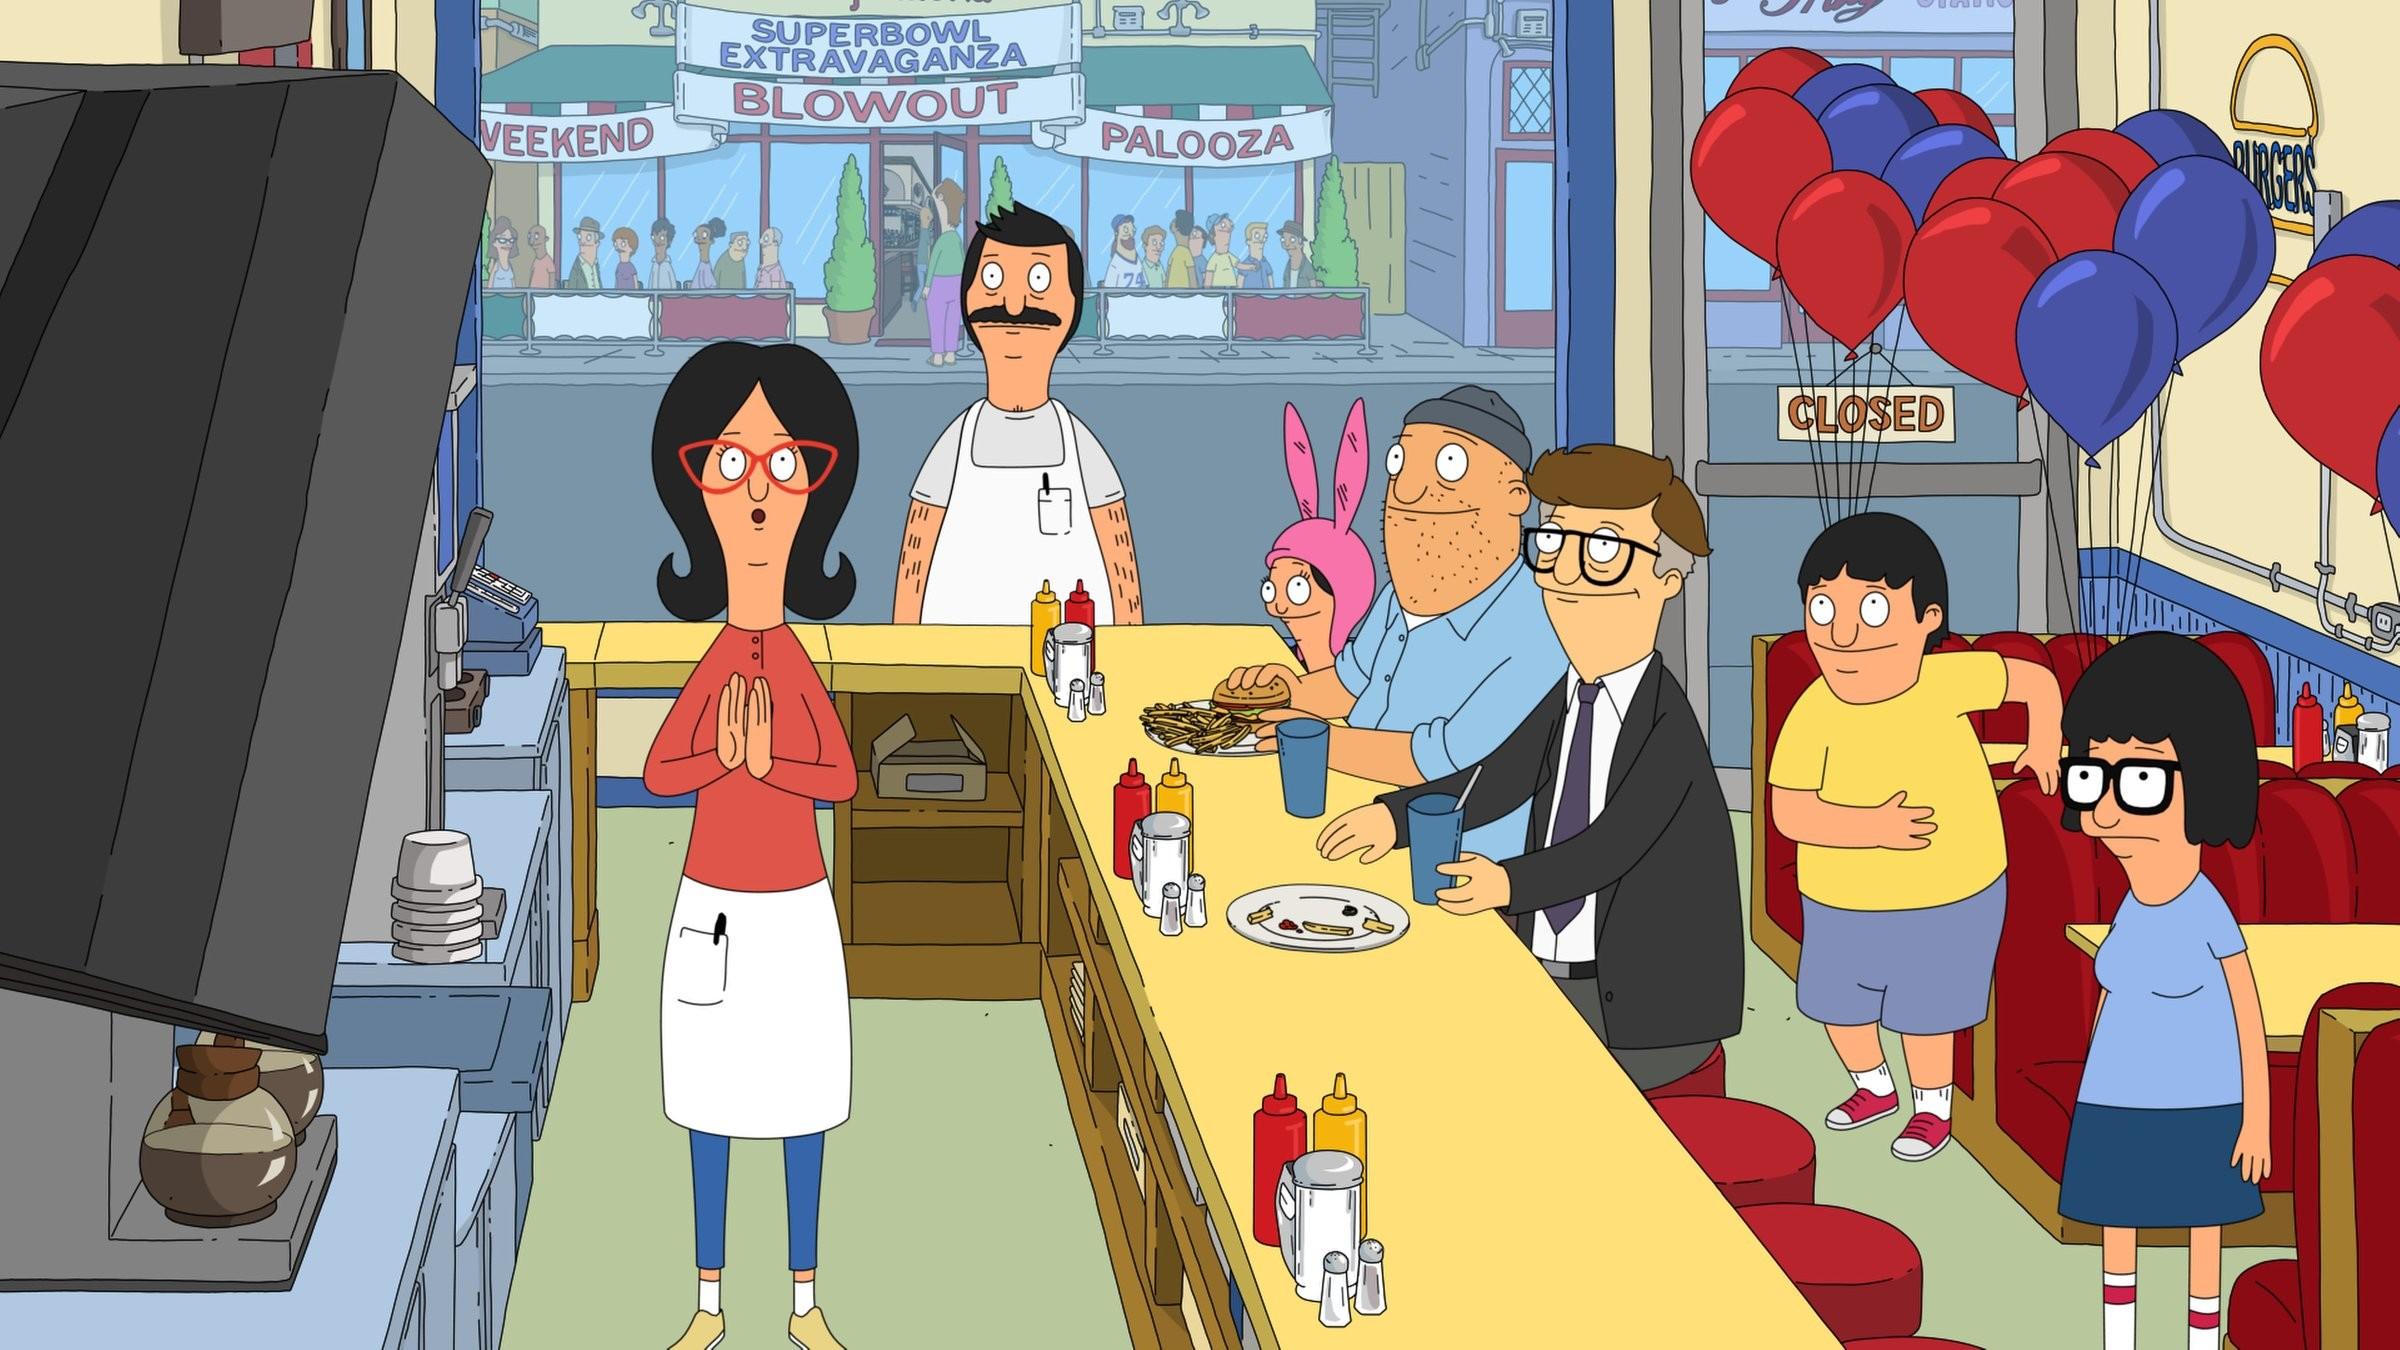 BOBS BURGERS animation comedy cartoon fox series family (24) wallpaper      353212   WallpaperUP